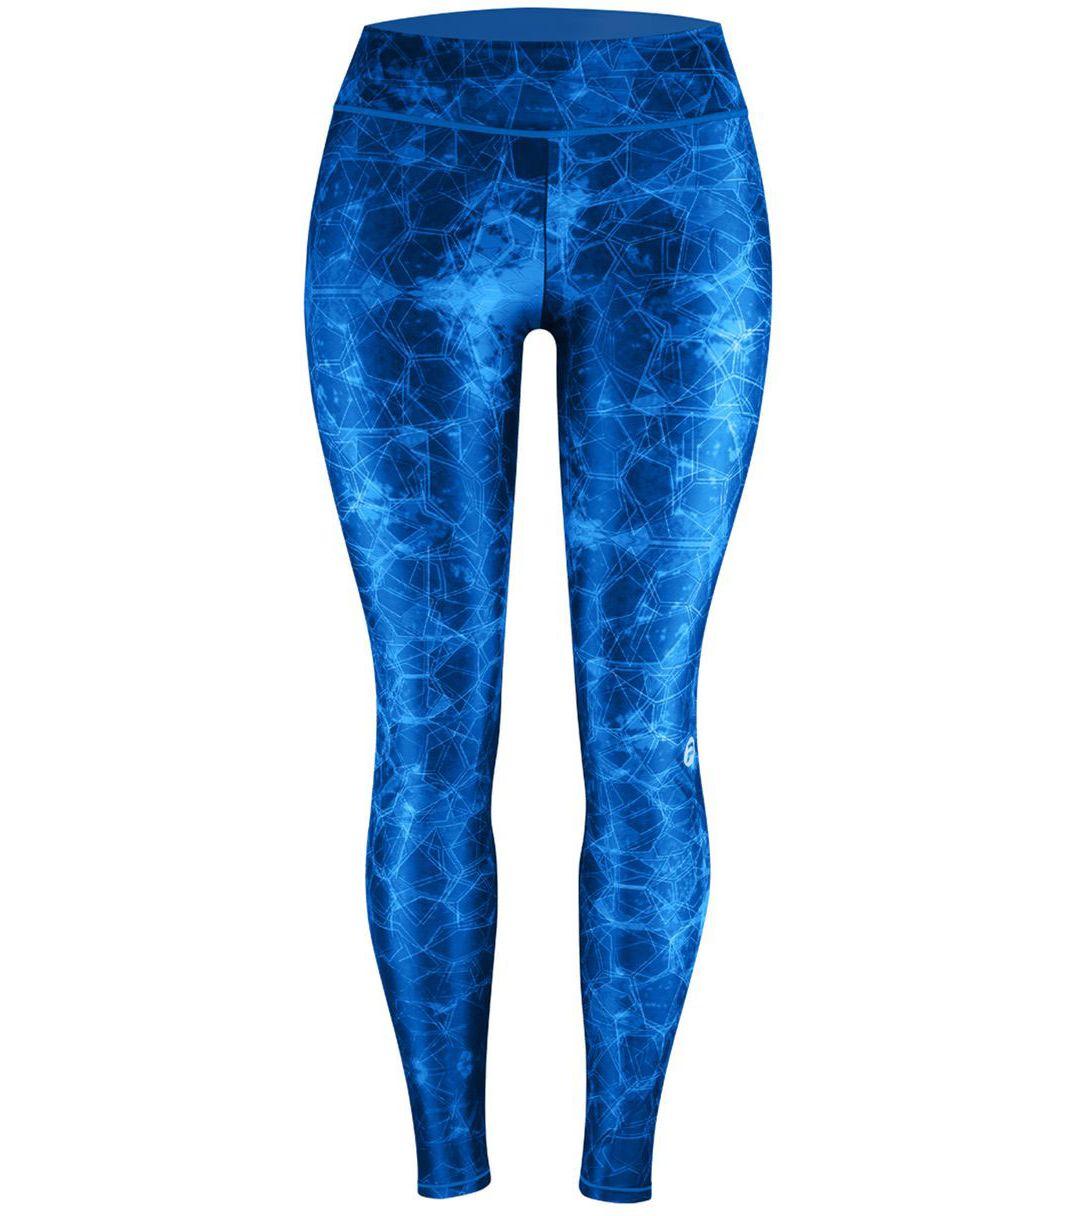 7cceb4619b8a0 Pelagic Women's Maui Leggings | DICK'S Sporting Goods